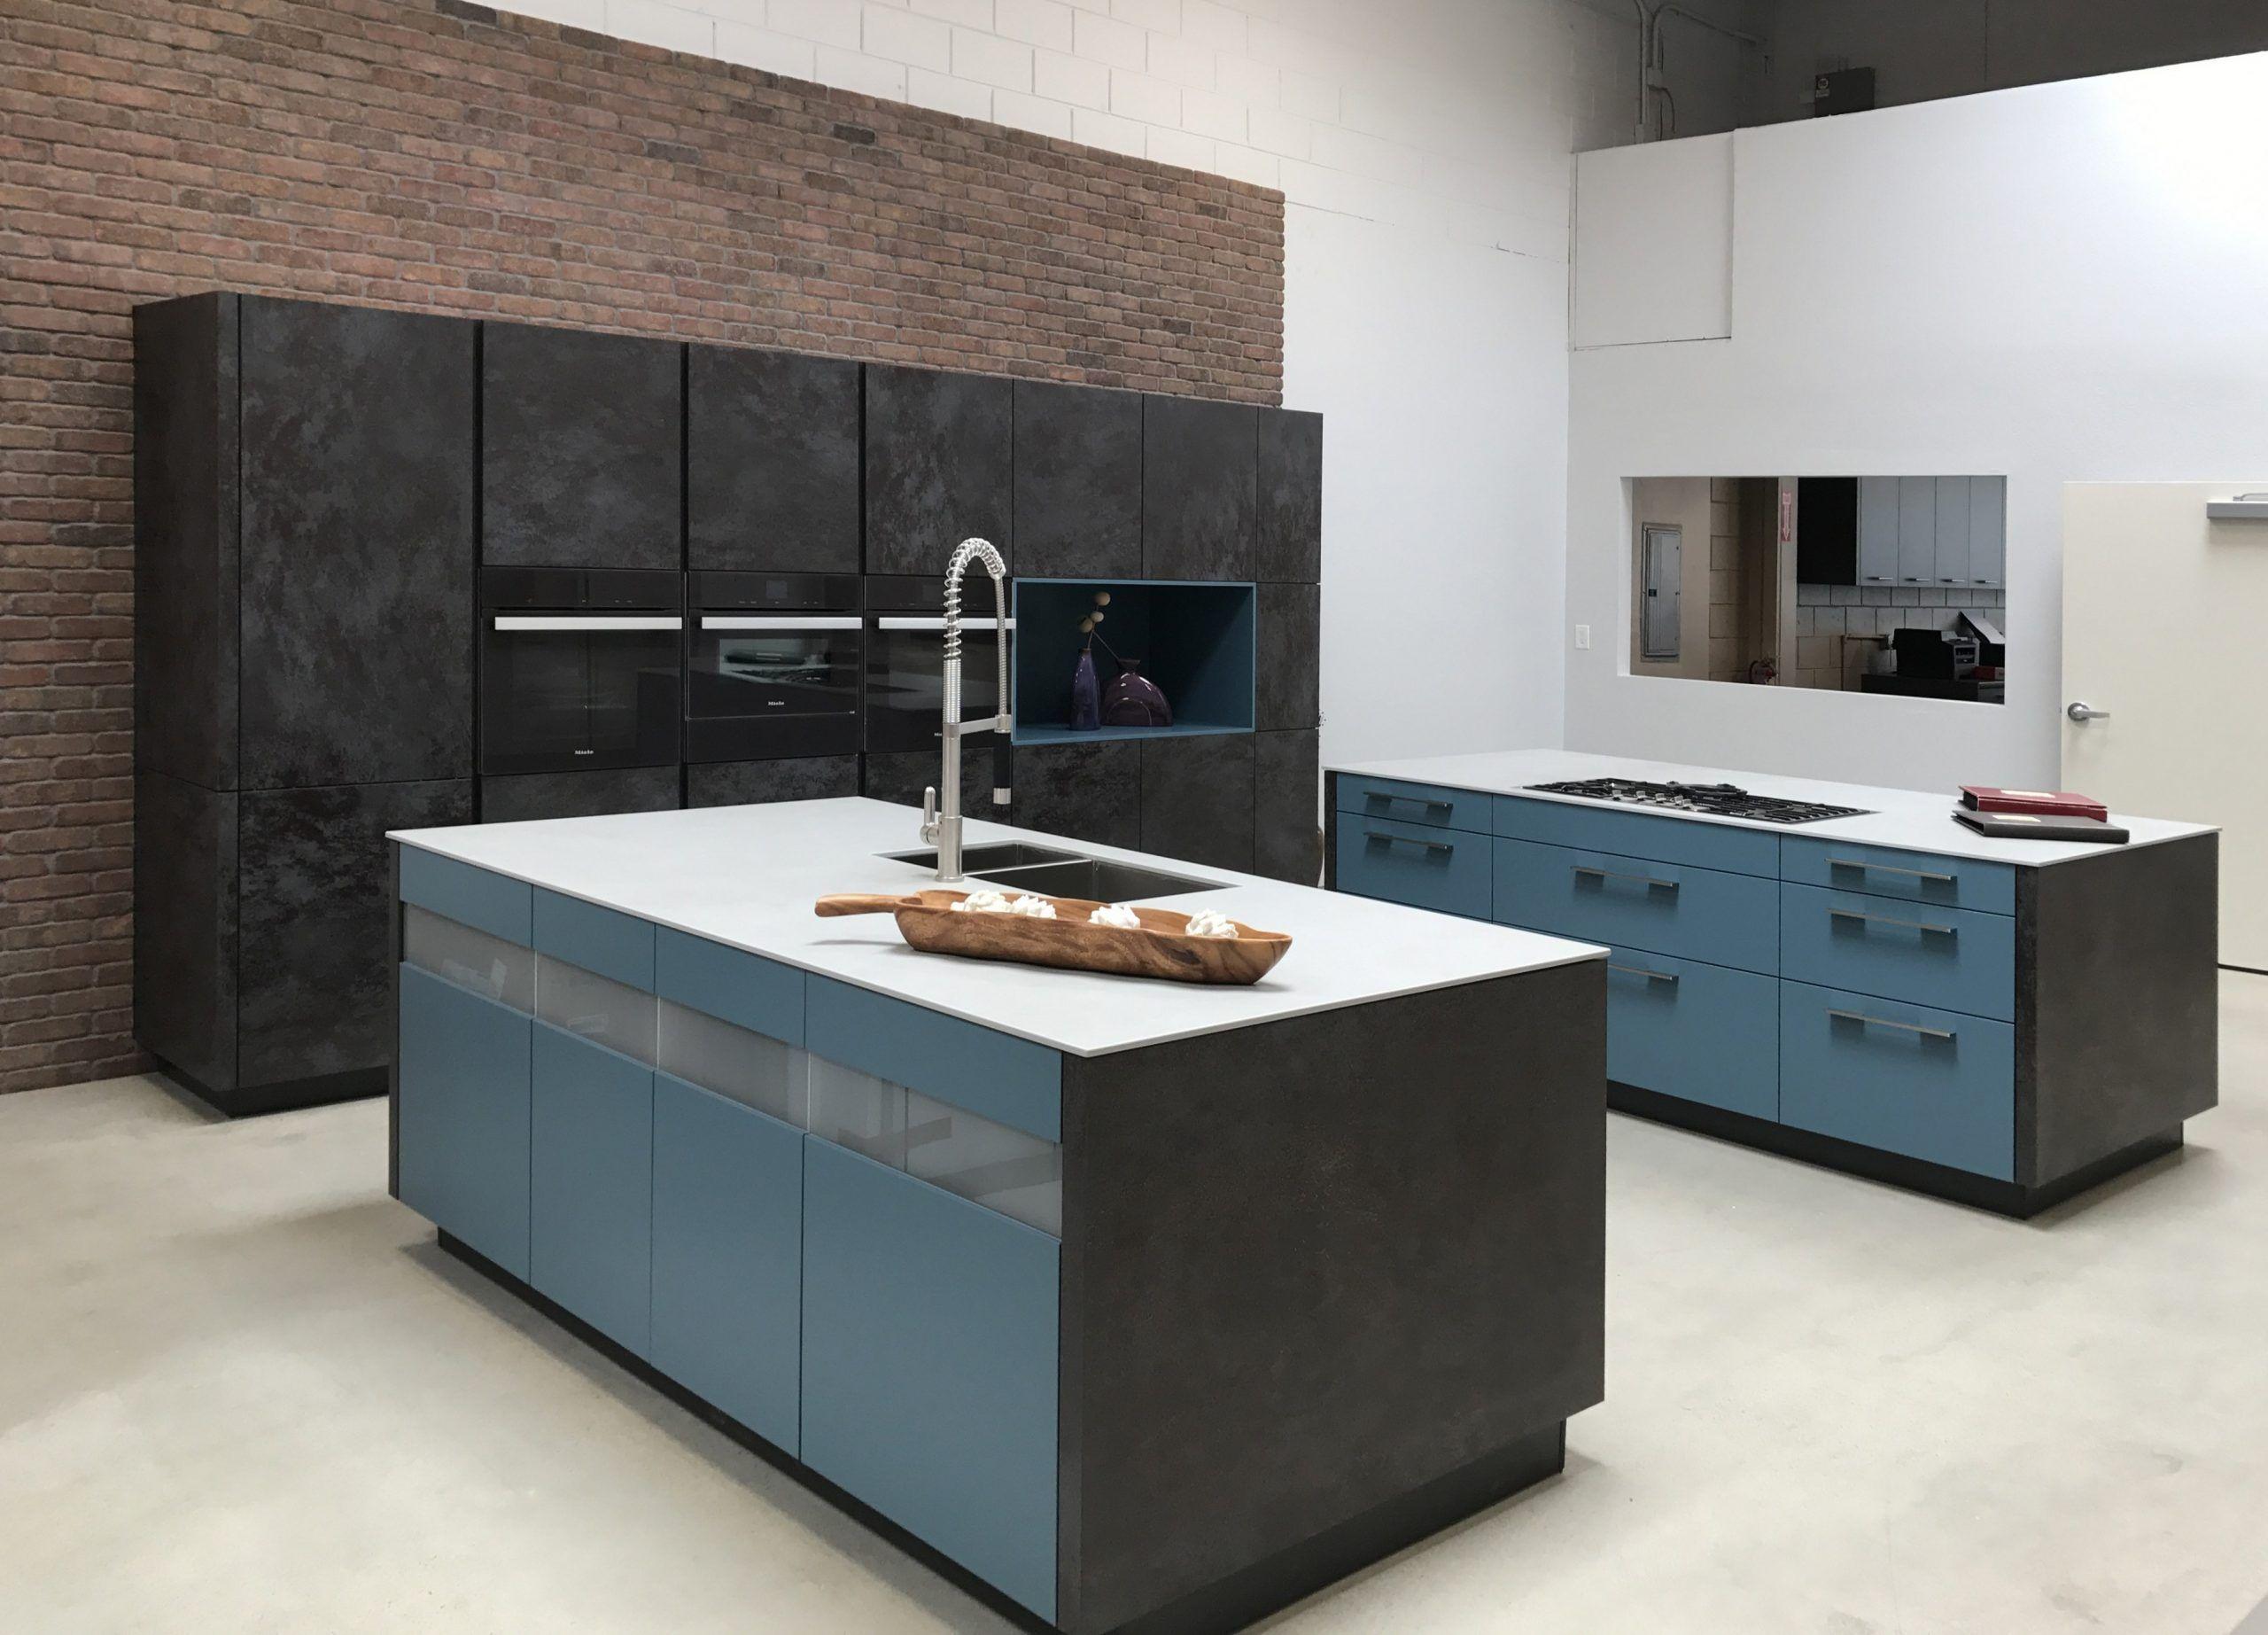 Alno Kitchen Cabinets